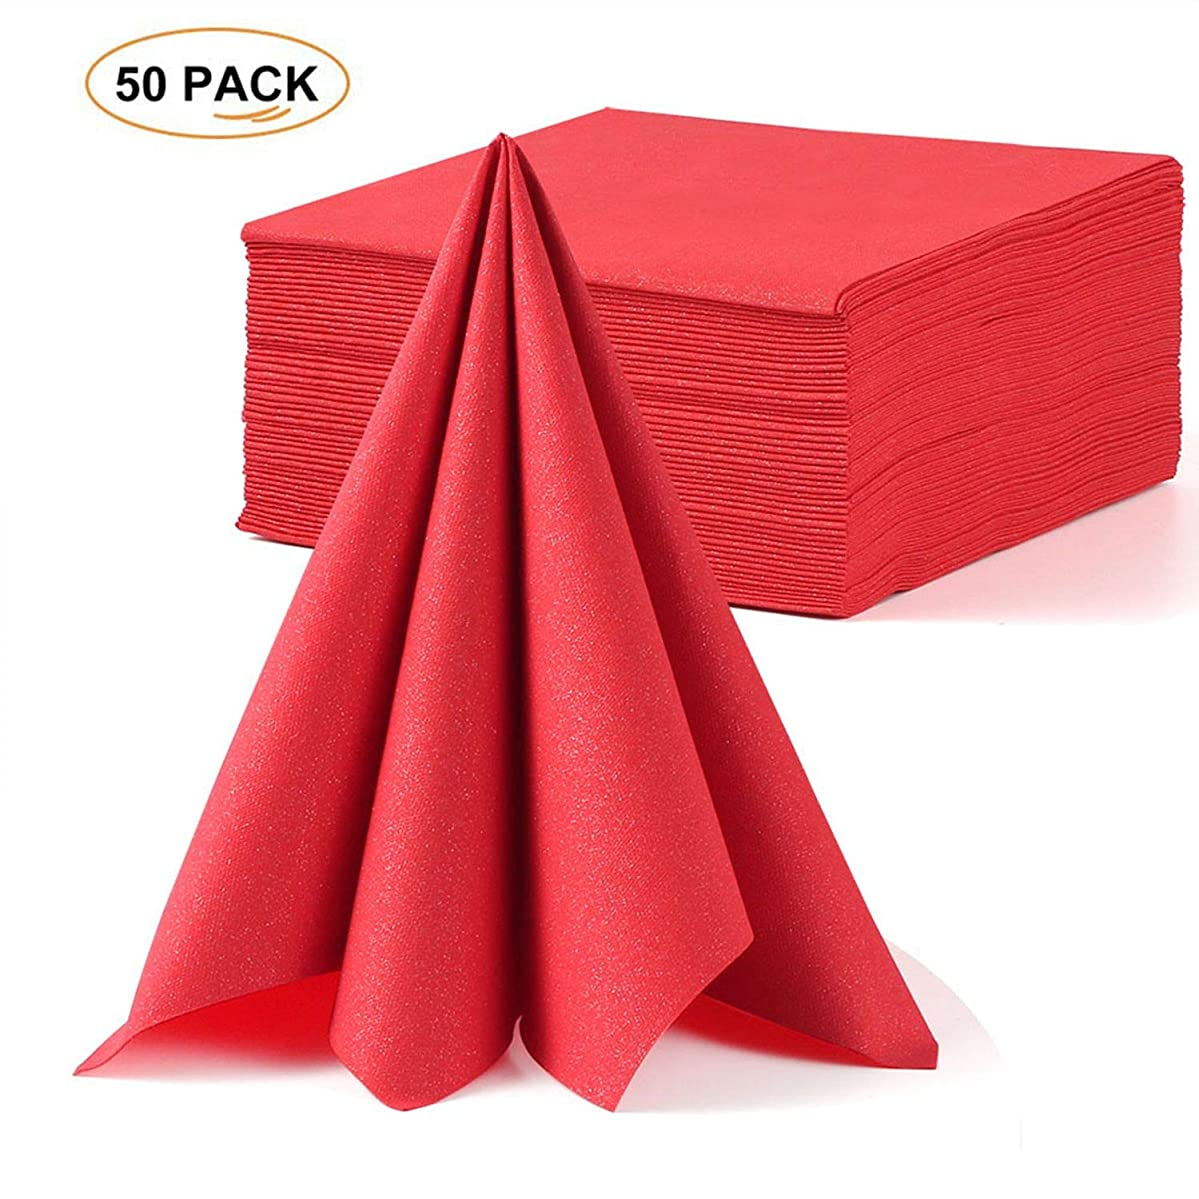 LEKOCH Red Wedding Napkin Linen Feel Guest Towel   Air-laid Dinner Napkin   Disposable Premium Napkins for Wedding, Anniversary 16